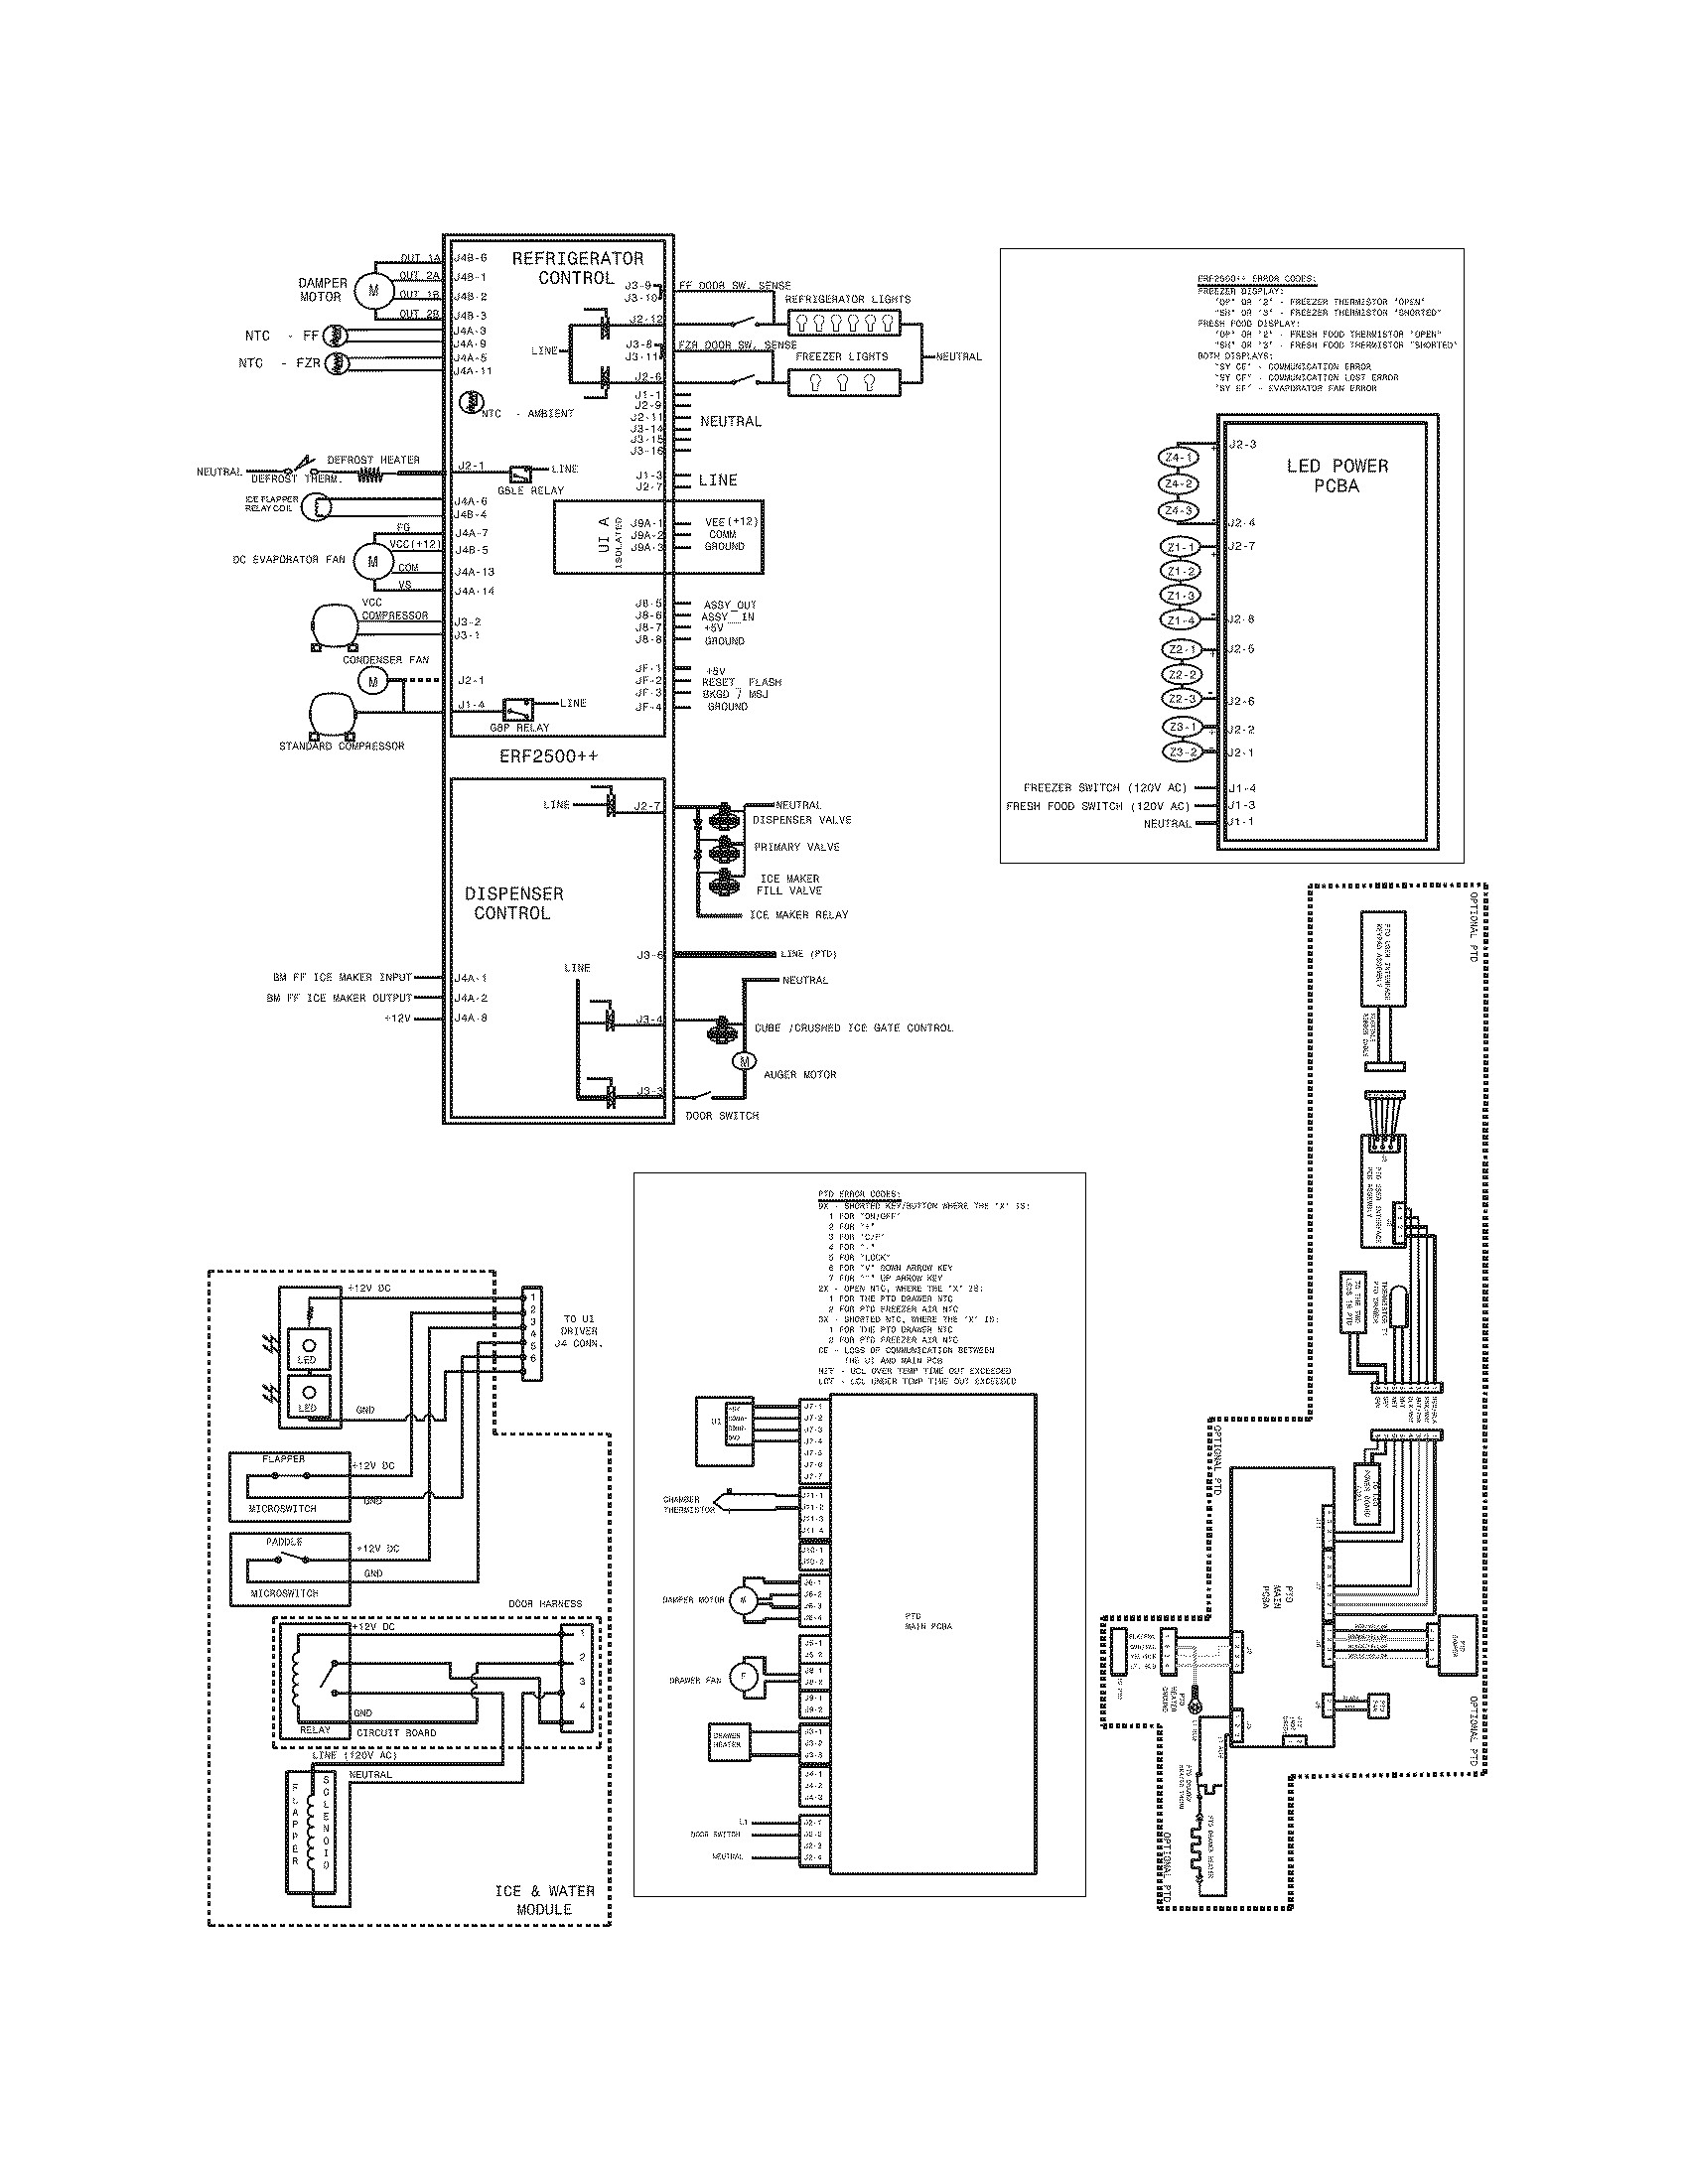 John Deere Gx345 Wiring Diagram John Deere Lx176 Wiring Diagram Diagram Base Website Wiring Of John Deere Gx345 Wiring Diagram